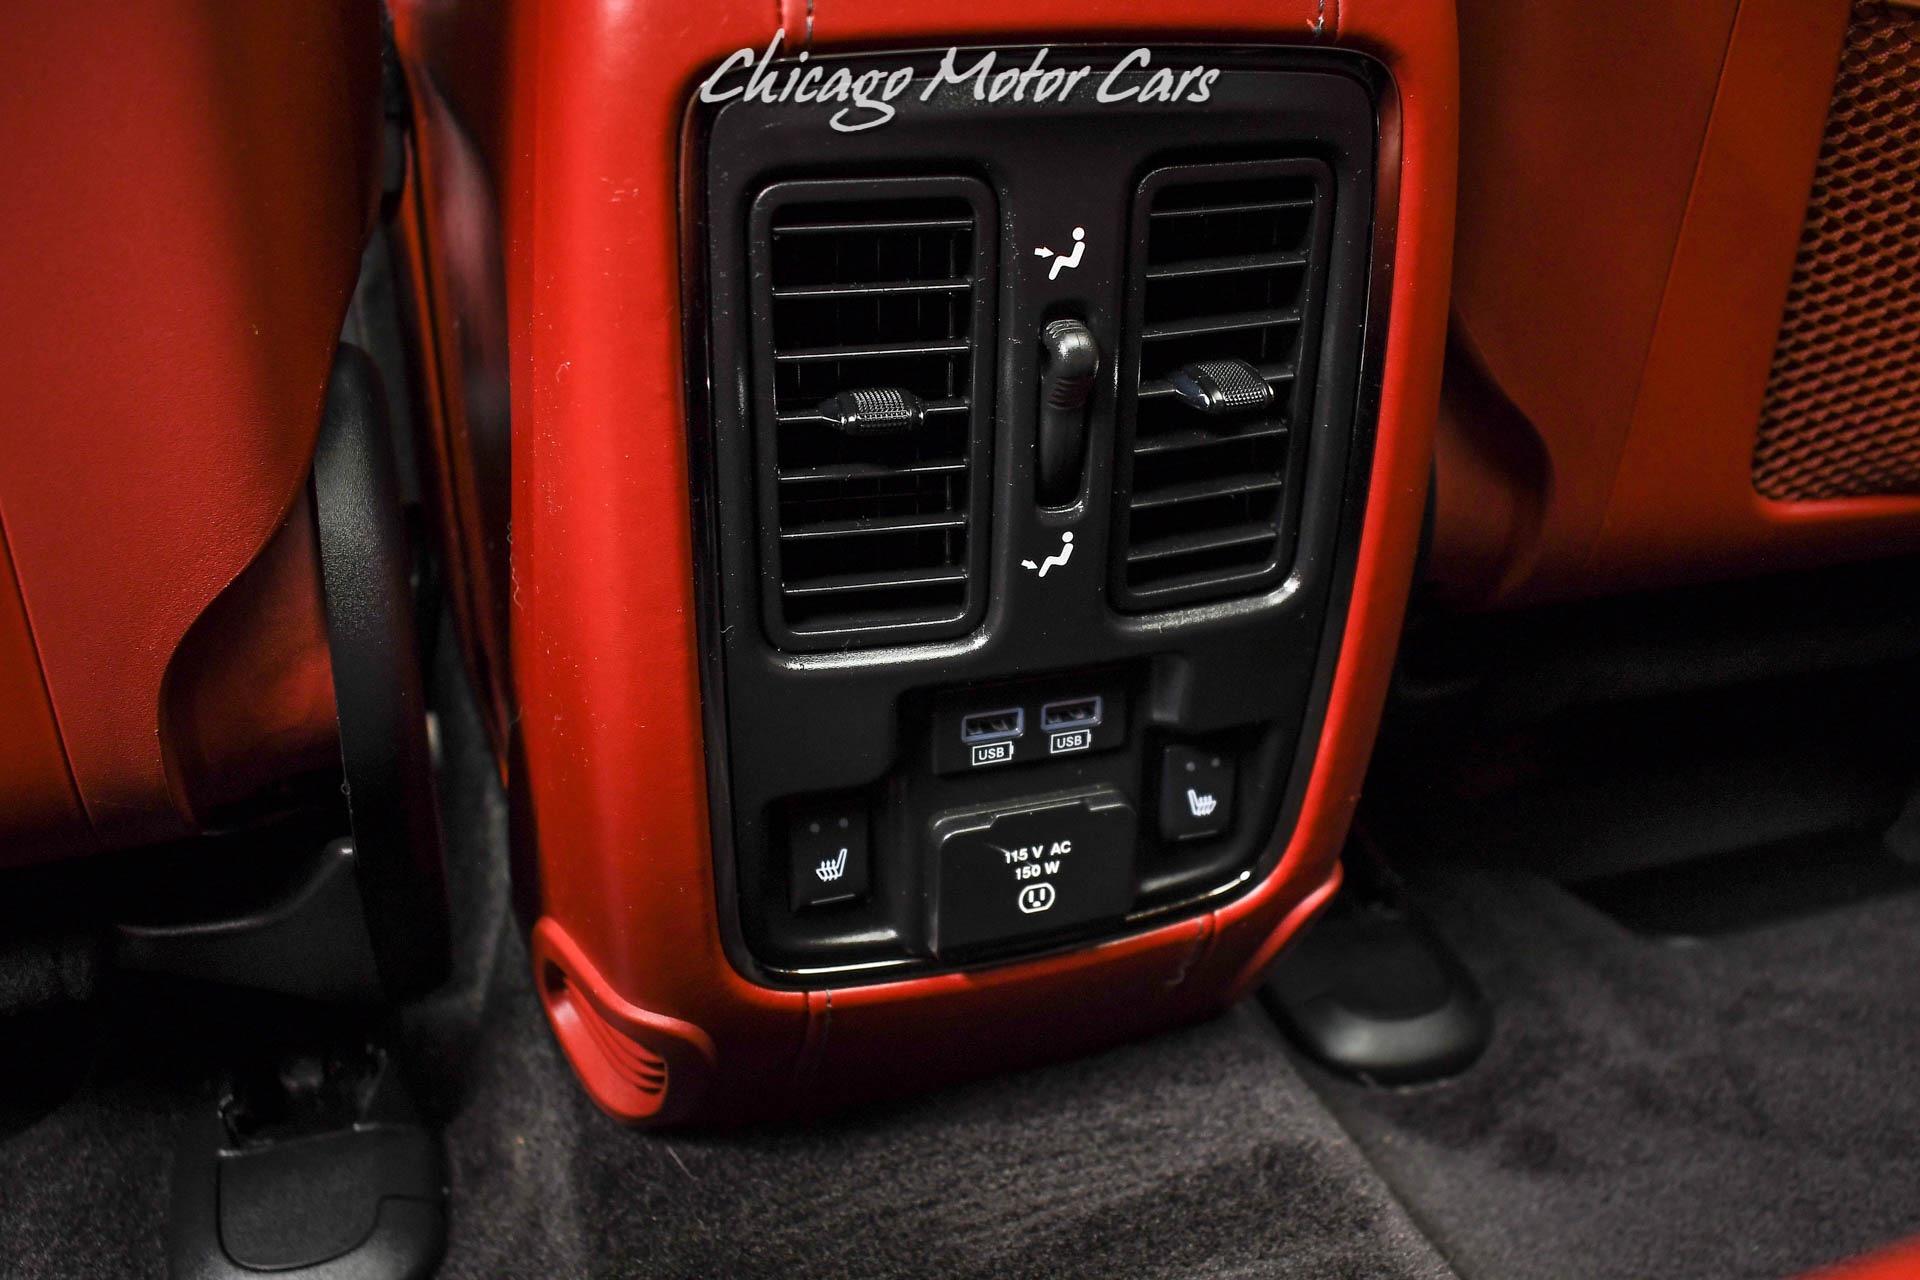 Used-2018-Jeep-Grand-Cherokee-Trackhawk-Upgraded-SRT-Audio-LOADED-1000-Horsepower